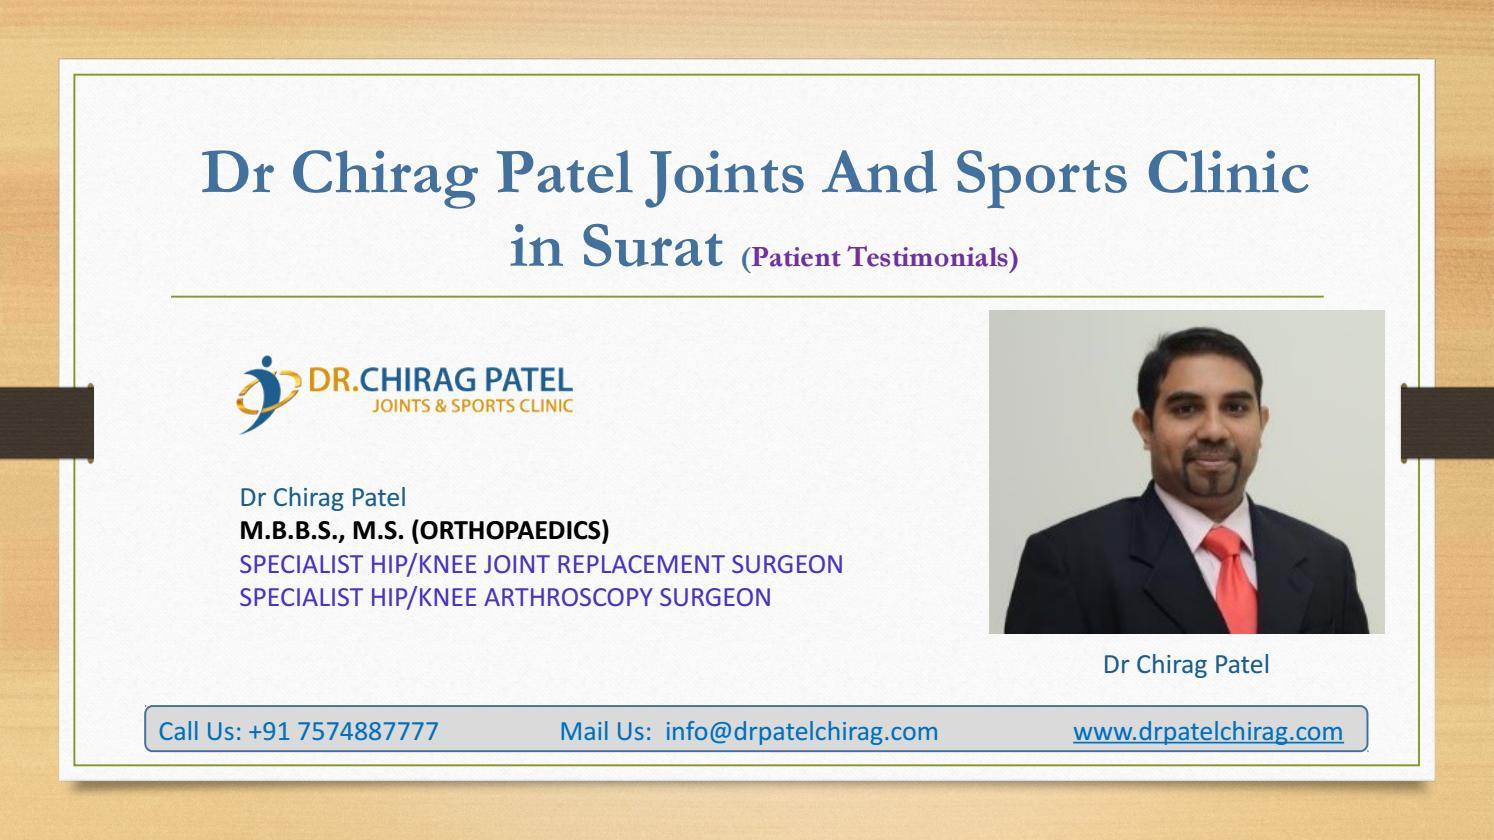 Dr Chirag Patel Patients Testimonials   Orthopaedic Surgeon